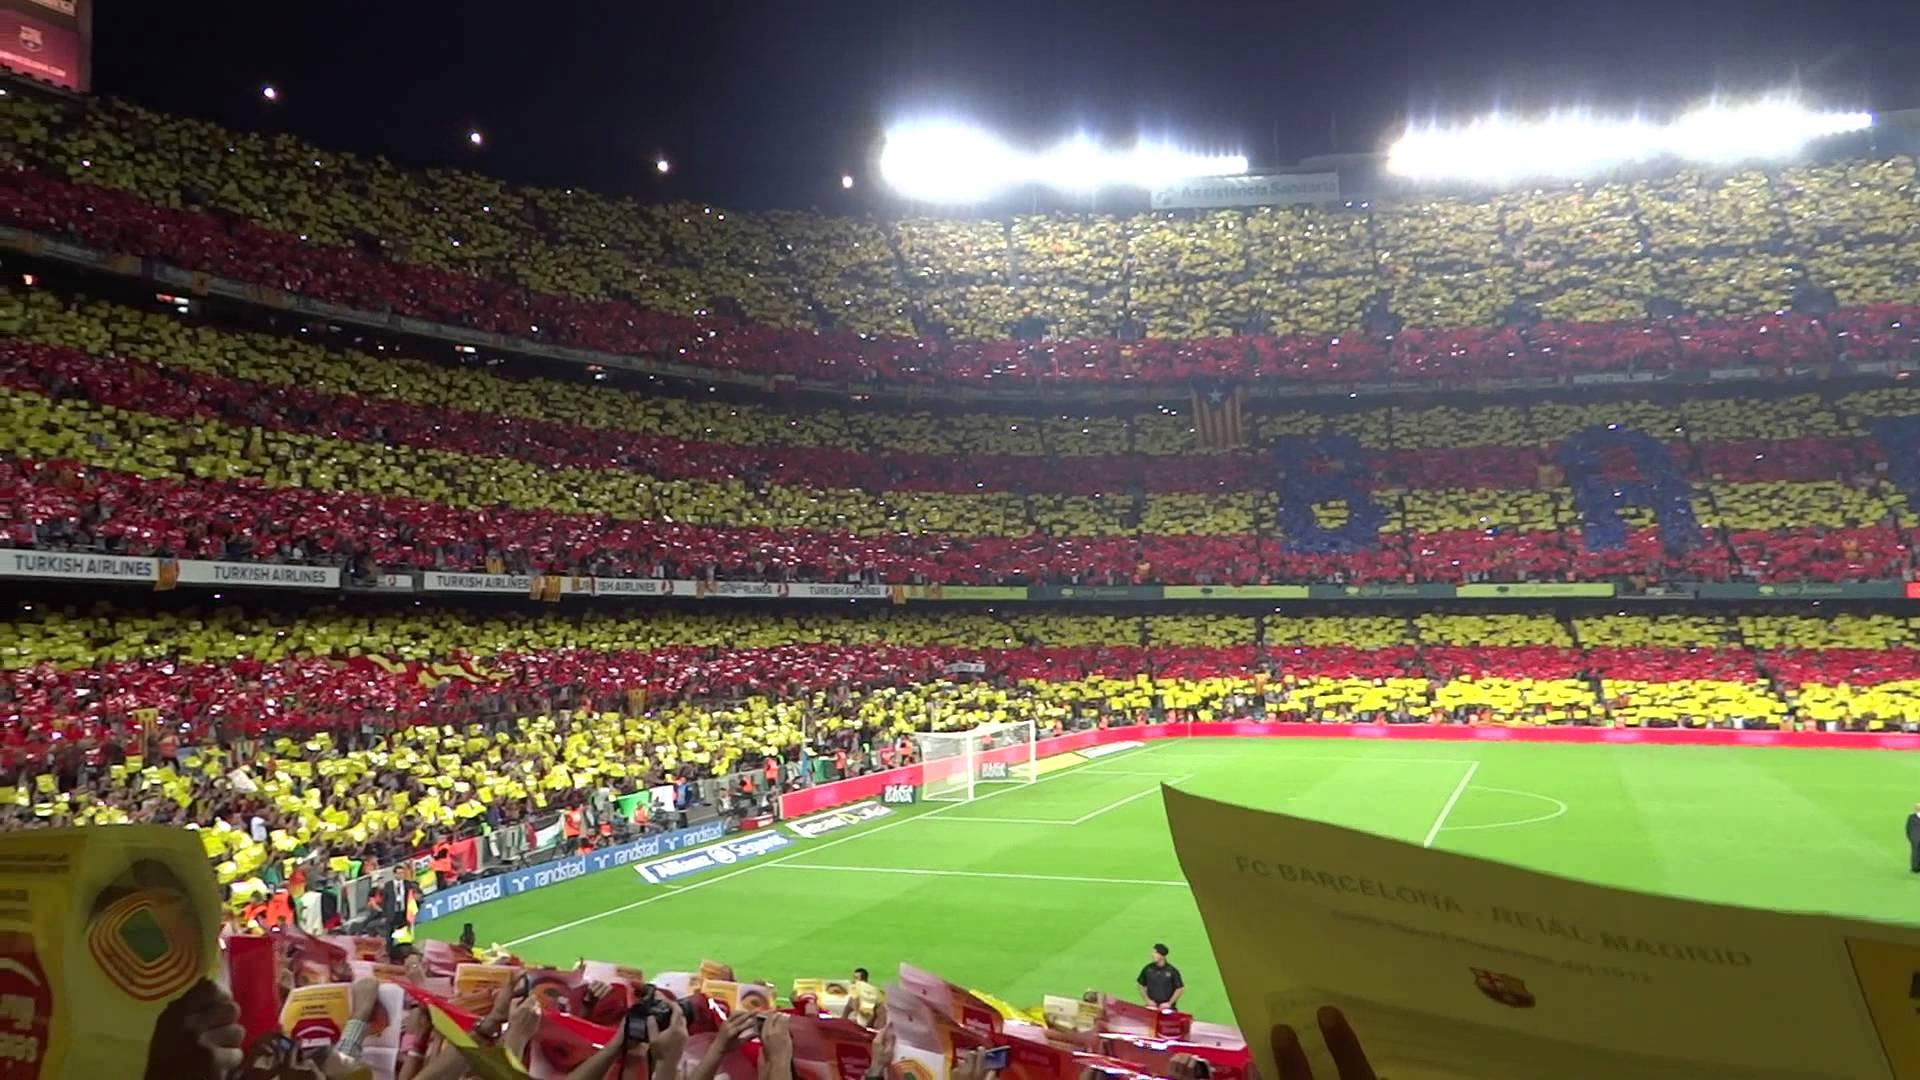 Camp Nou Wallpaper Download 1920x1080